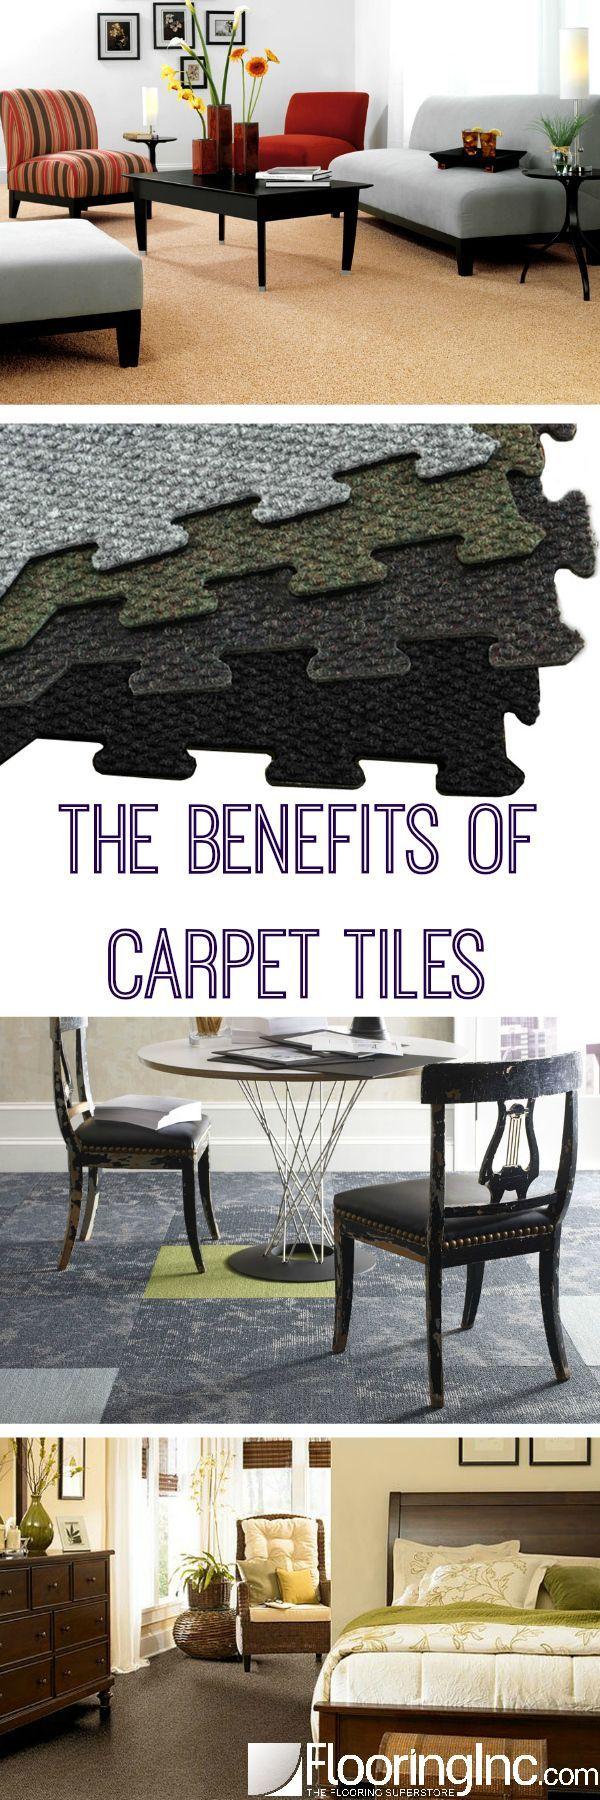 Harley color carpet tiles - The Benefits Of Carpet Tiles